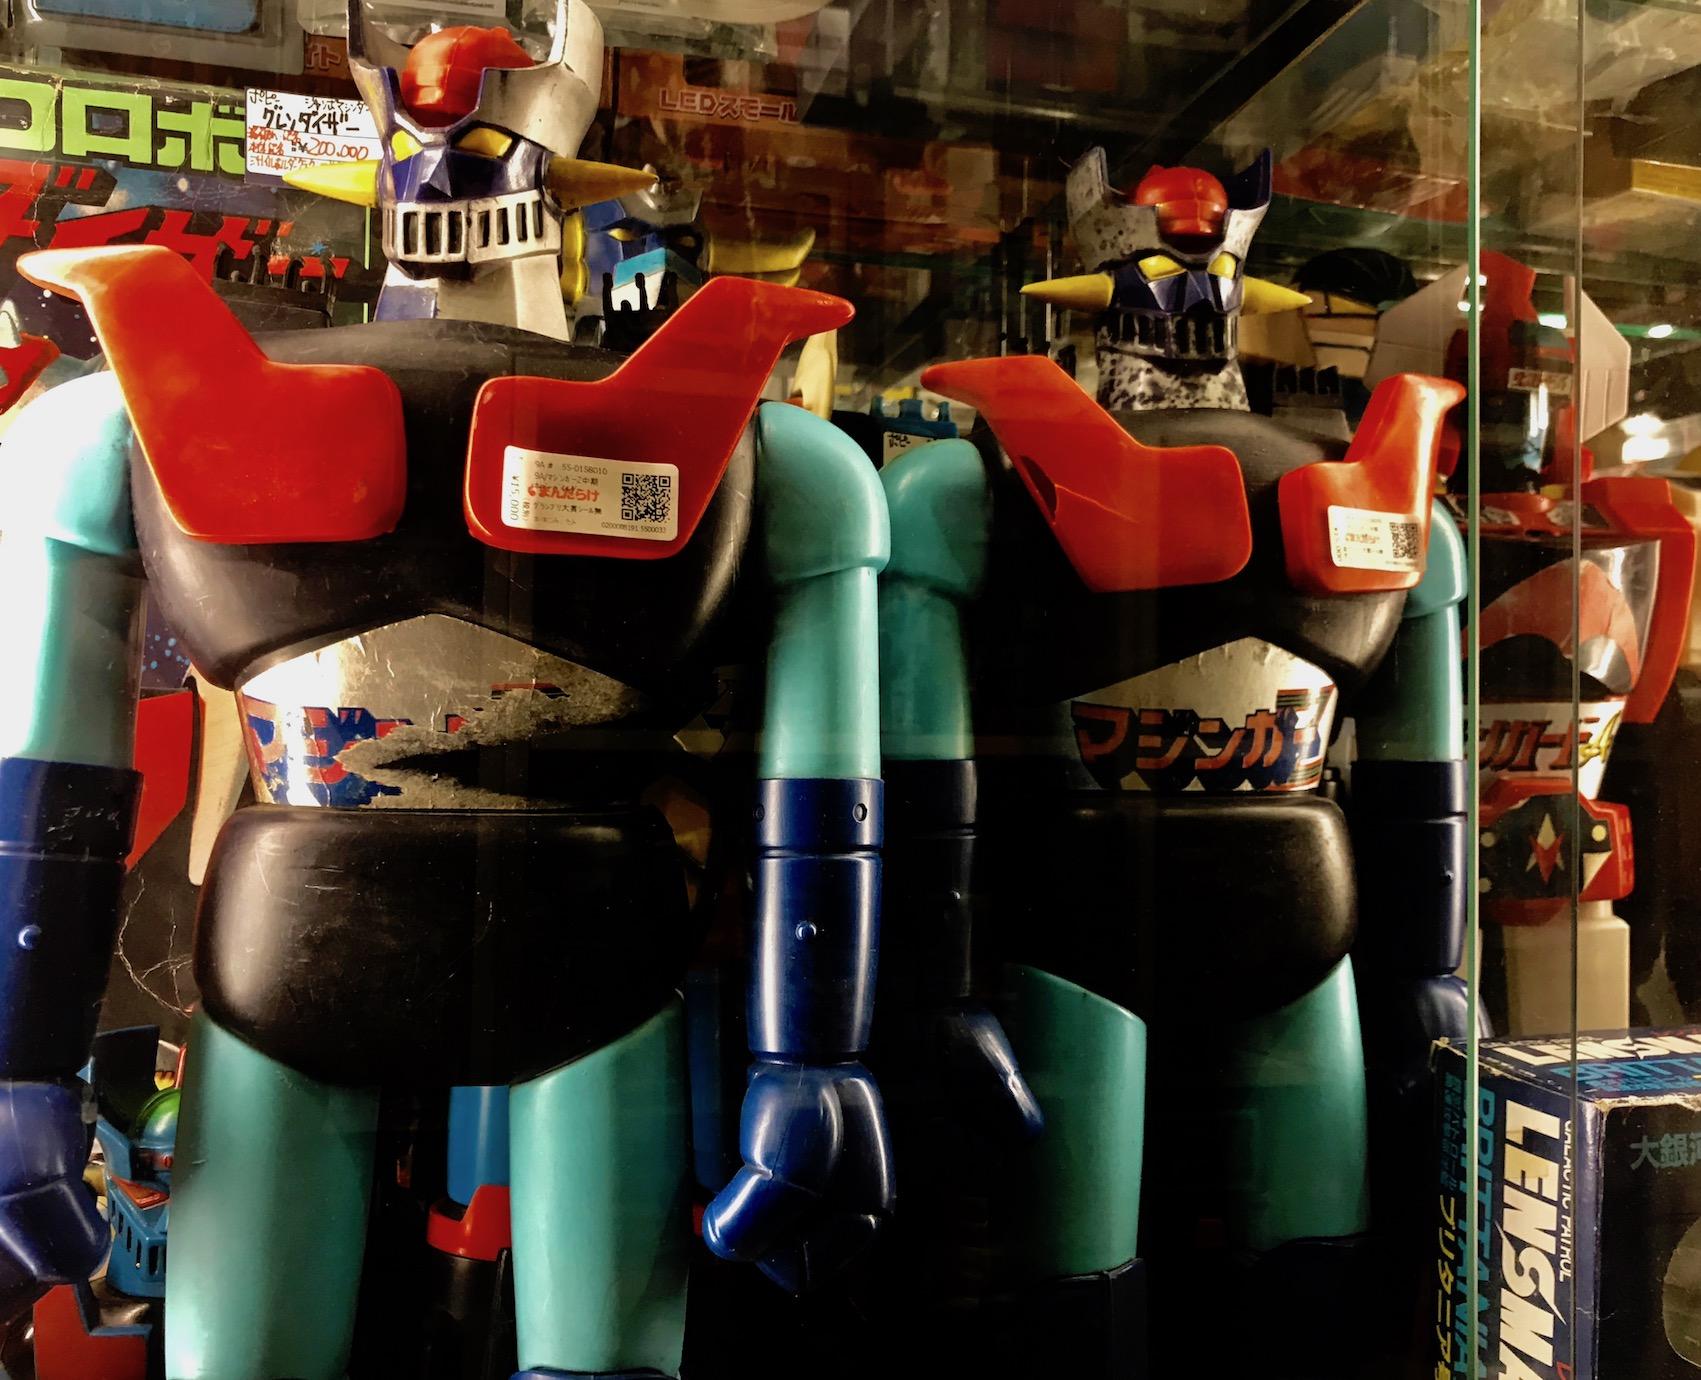 Toy robots 8th floor Mandarake Complex Tokyo